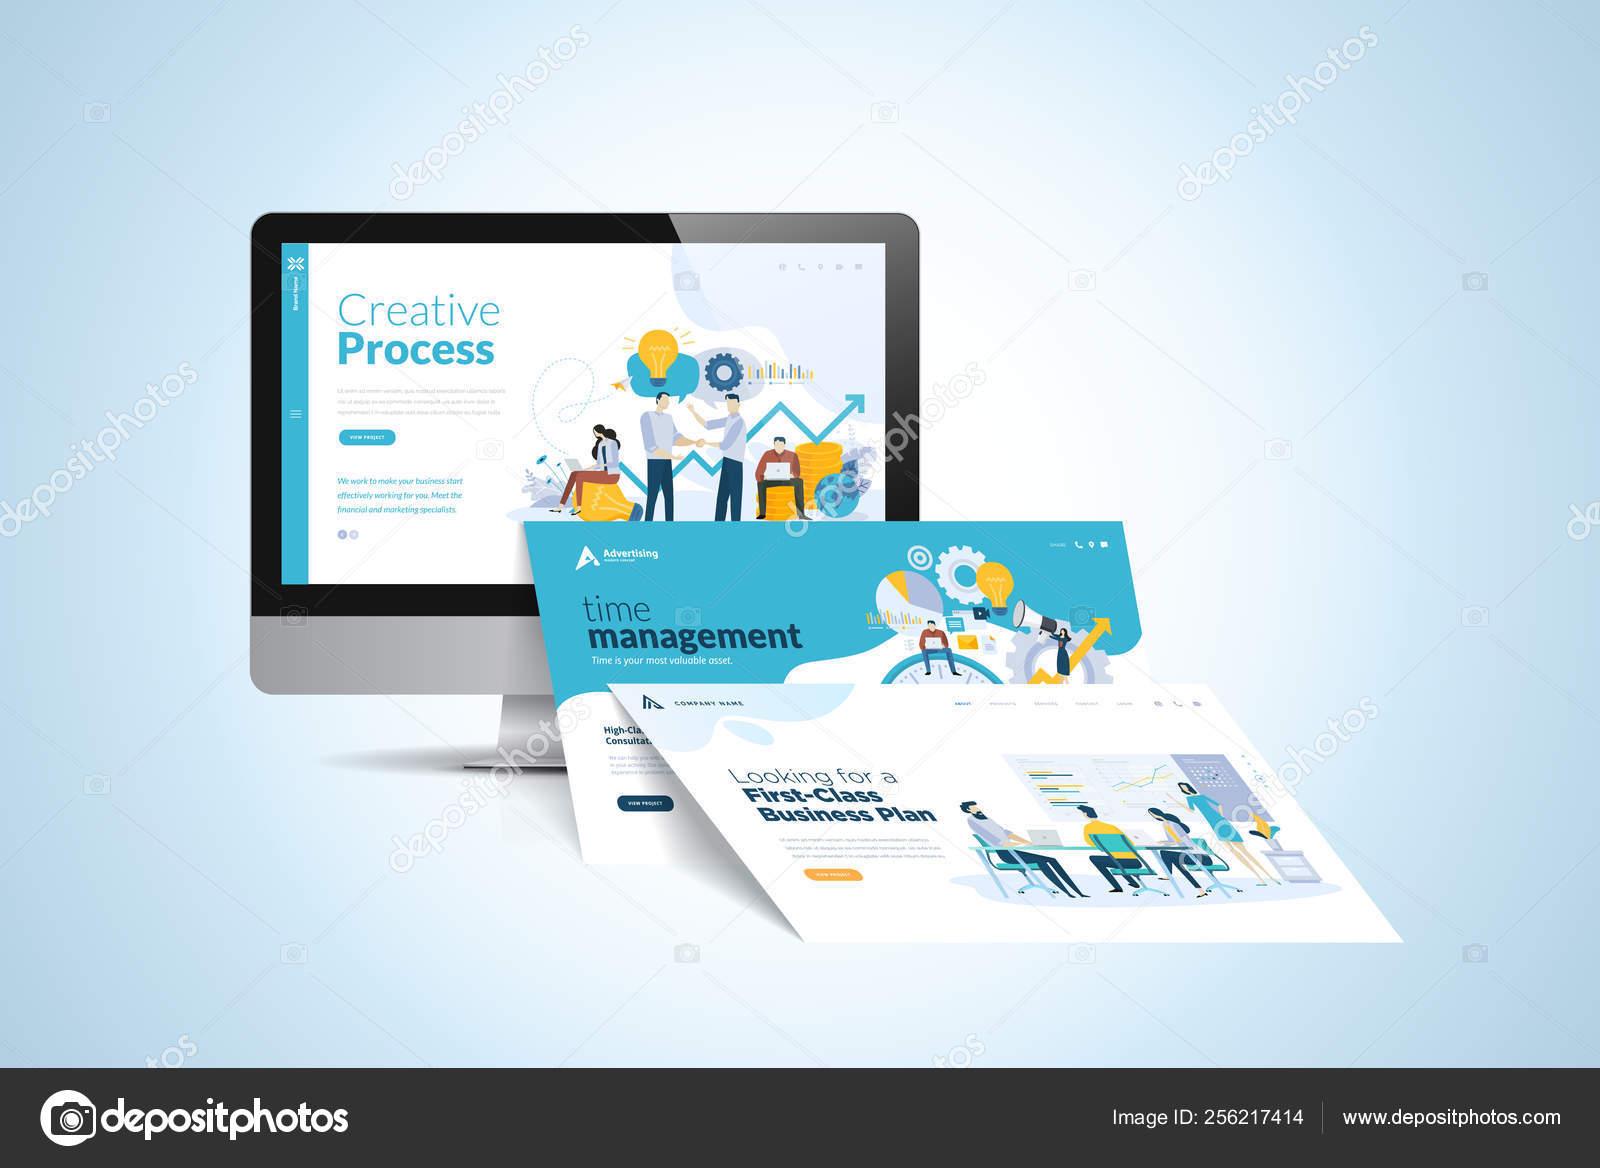 Web Design Template Vector Illustration Concept Website Design Development App Stock Vector C Variant 256217414